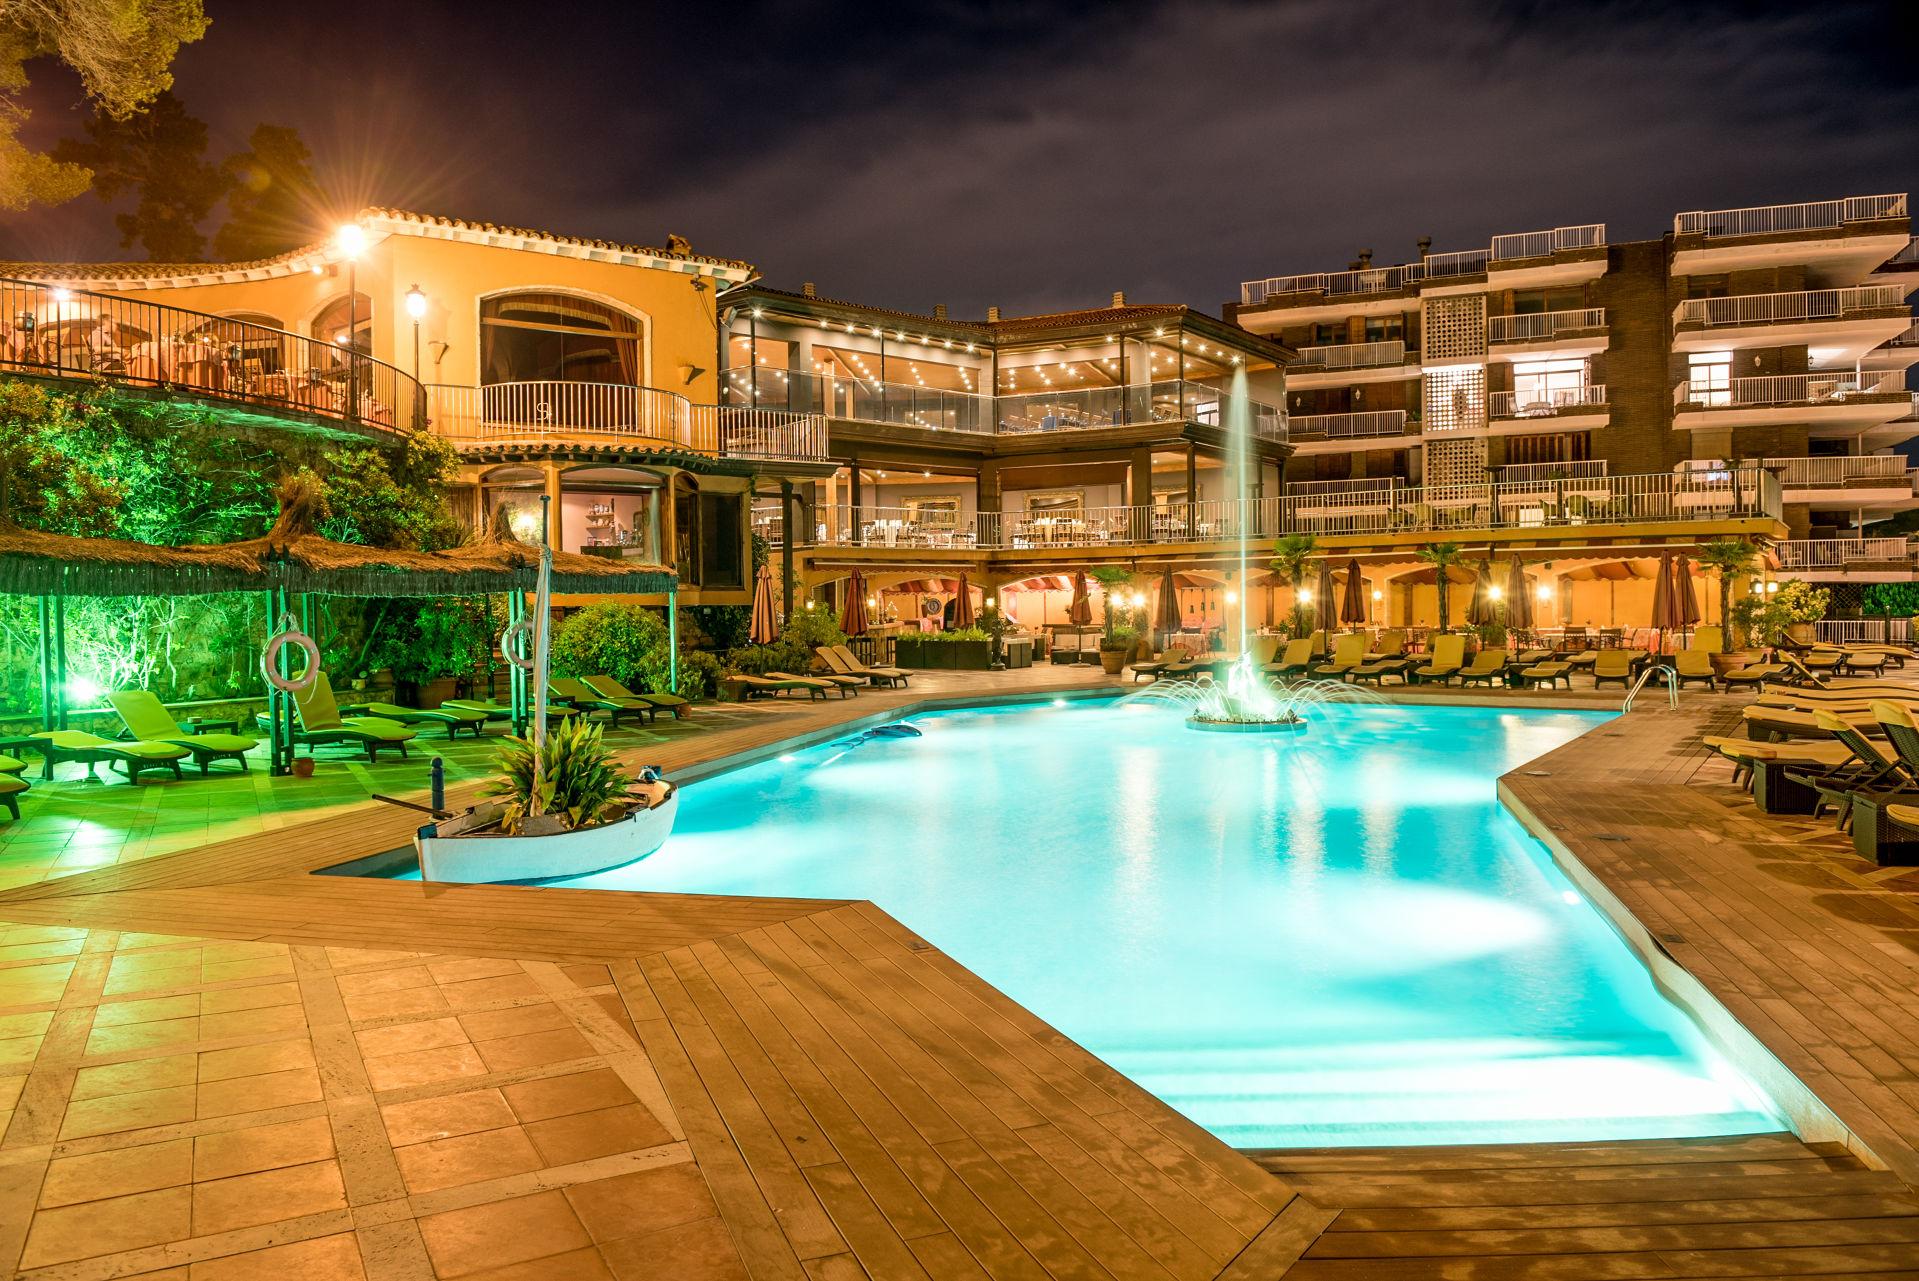 51da2-Rigat_Park_Spa_Hotel-162.jpg